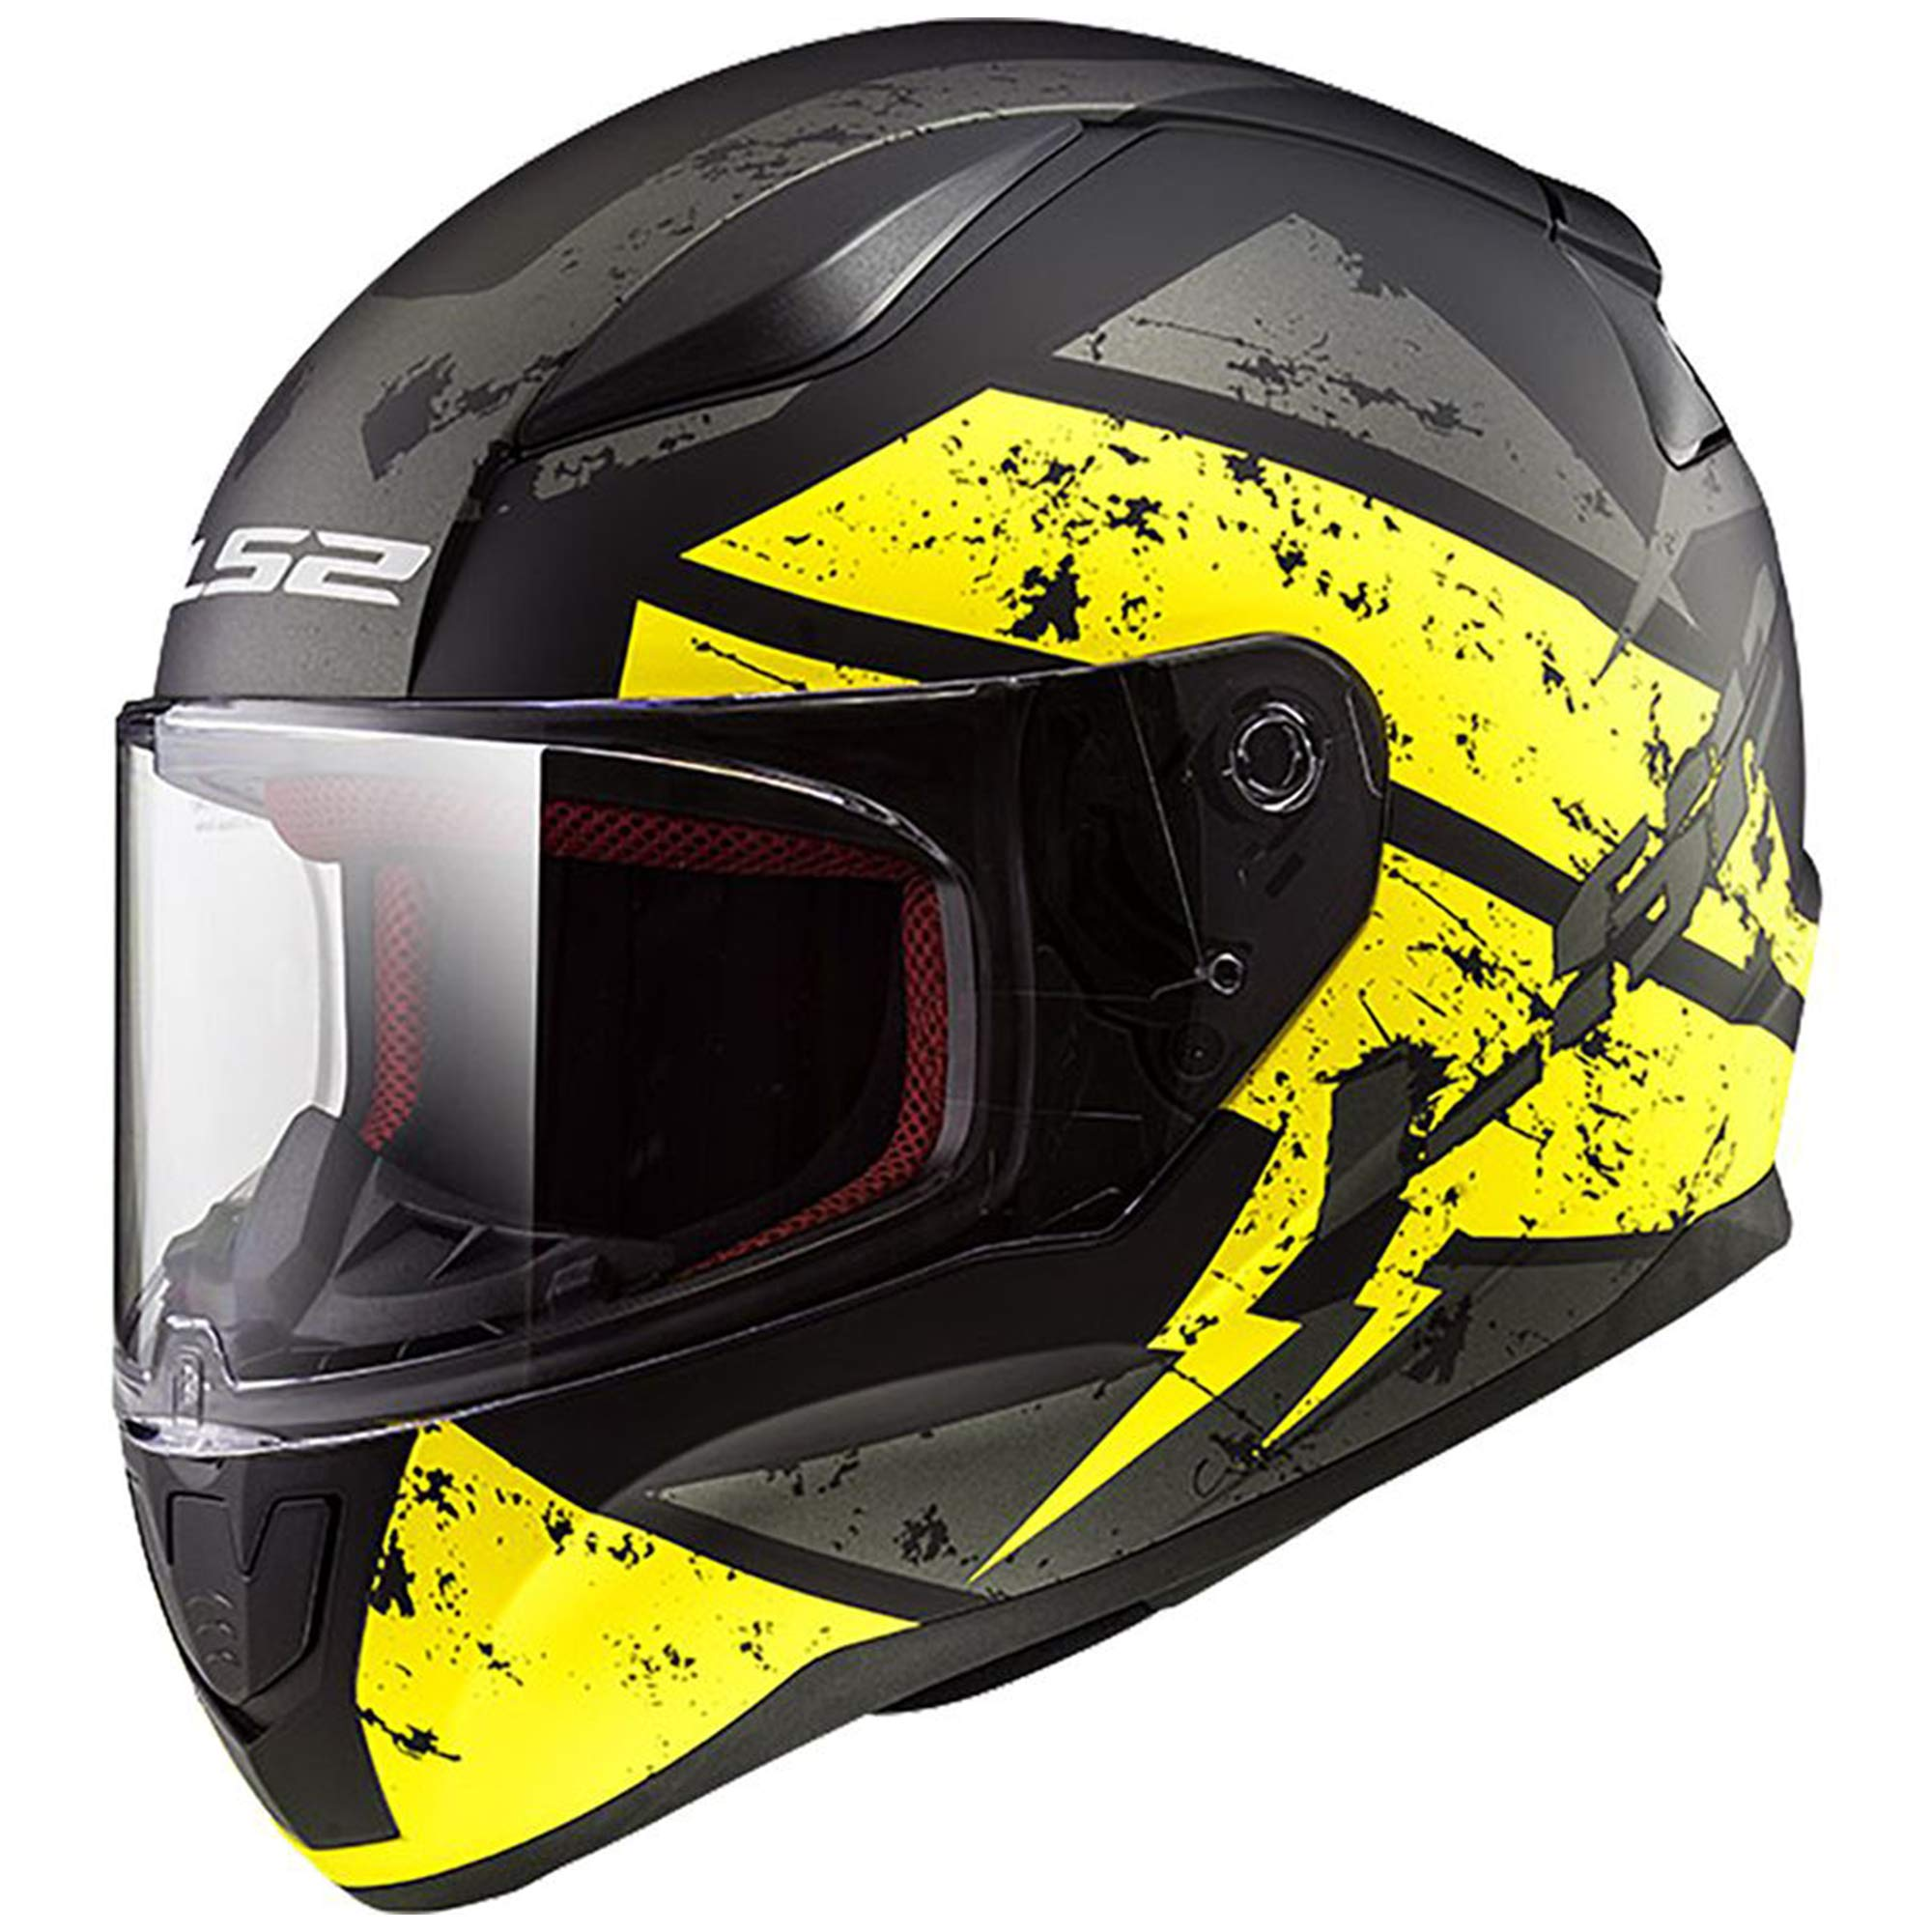 HJC 582-614 IS-17 Full-Face Motorcycle Helmet Matte Black, Large